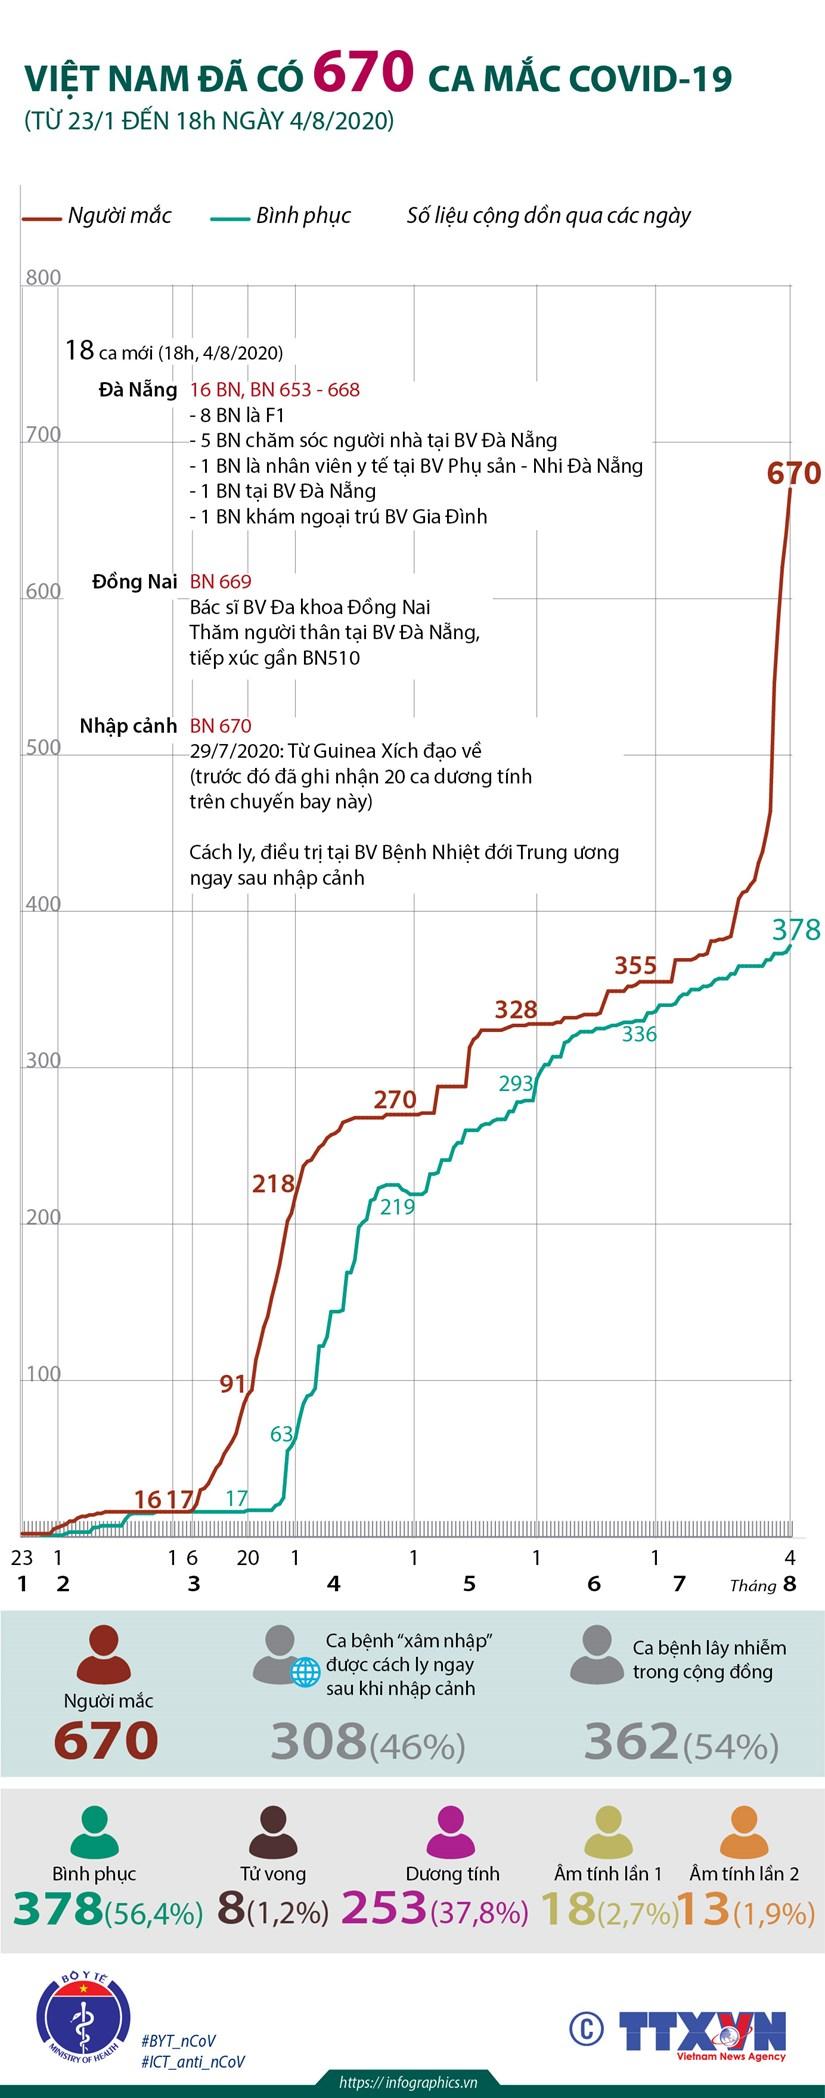 [Infographics] Viet Nam da co 670 ca mac COVID-19 hinh anh 1